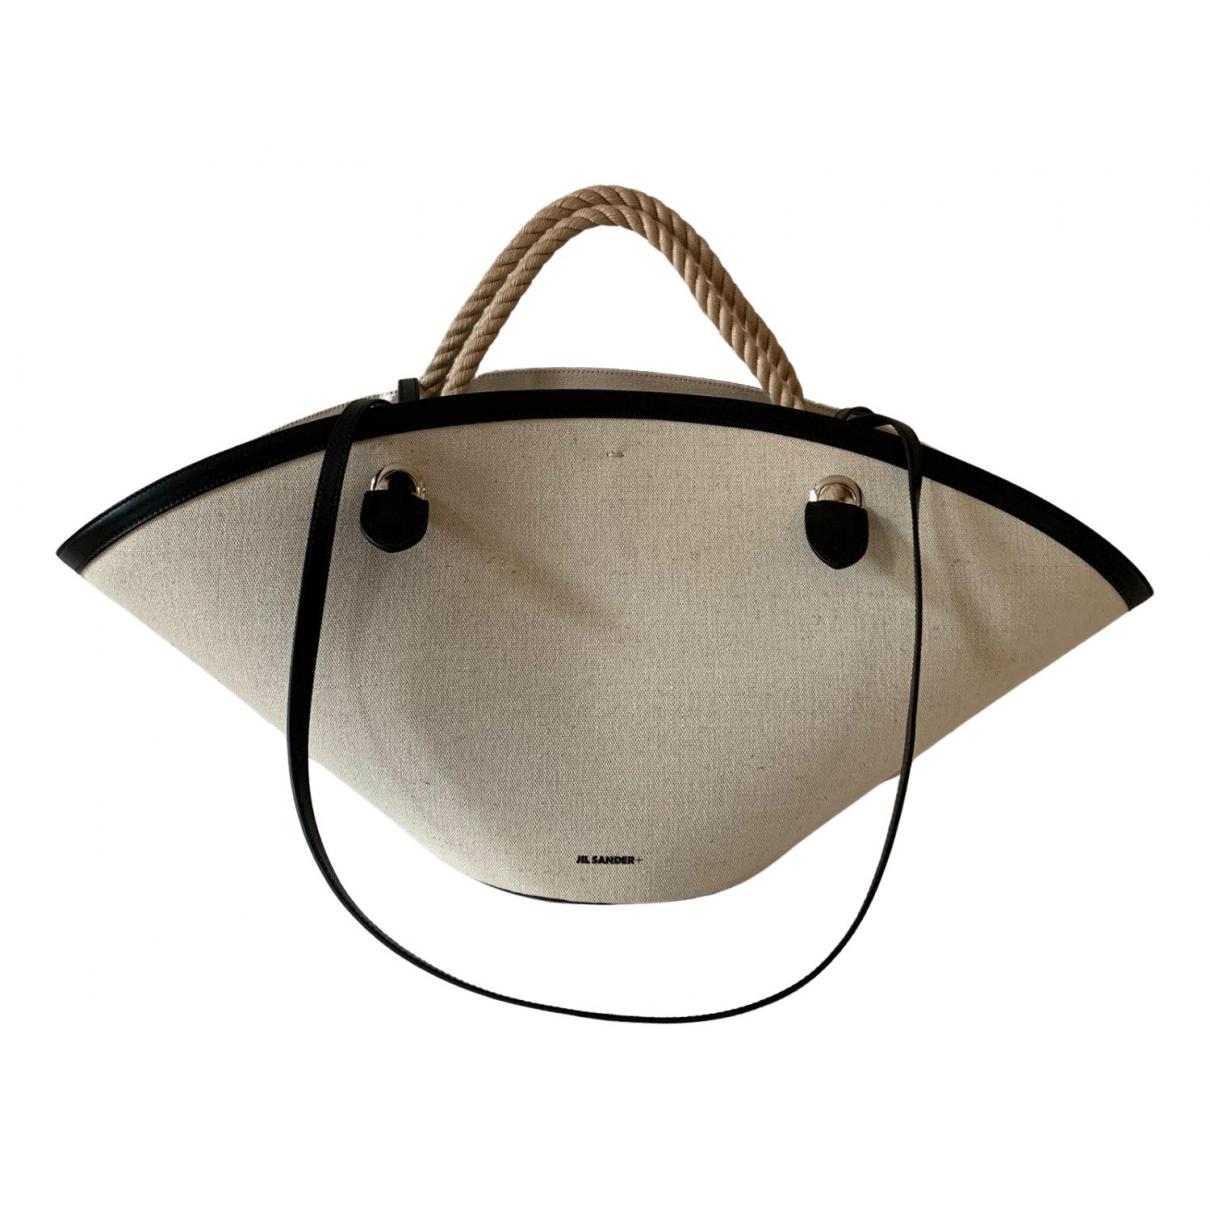 Jil Sander Shopper Ecru Cloth handbag for Women \N